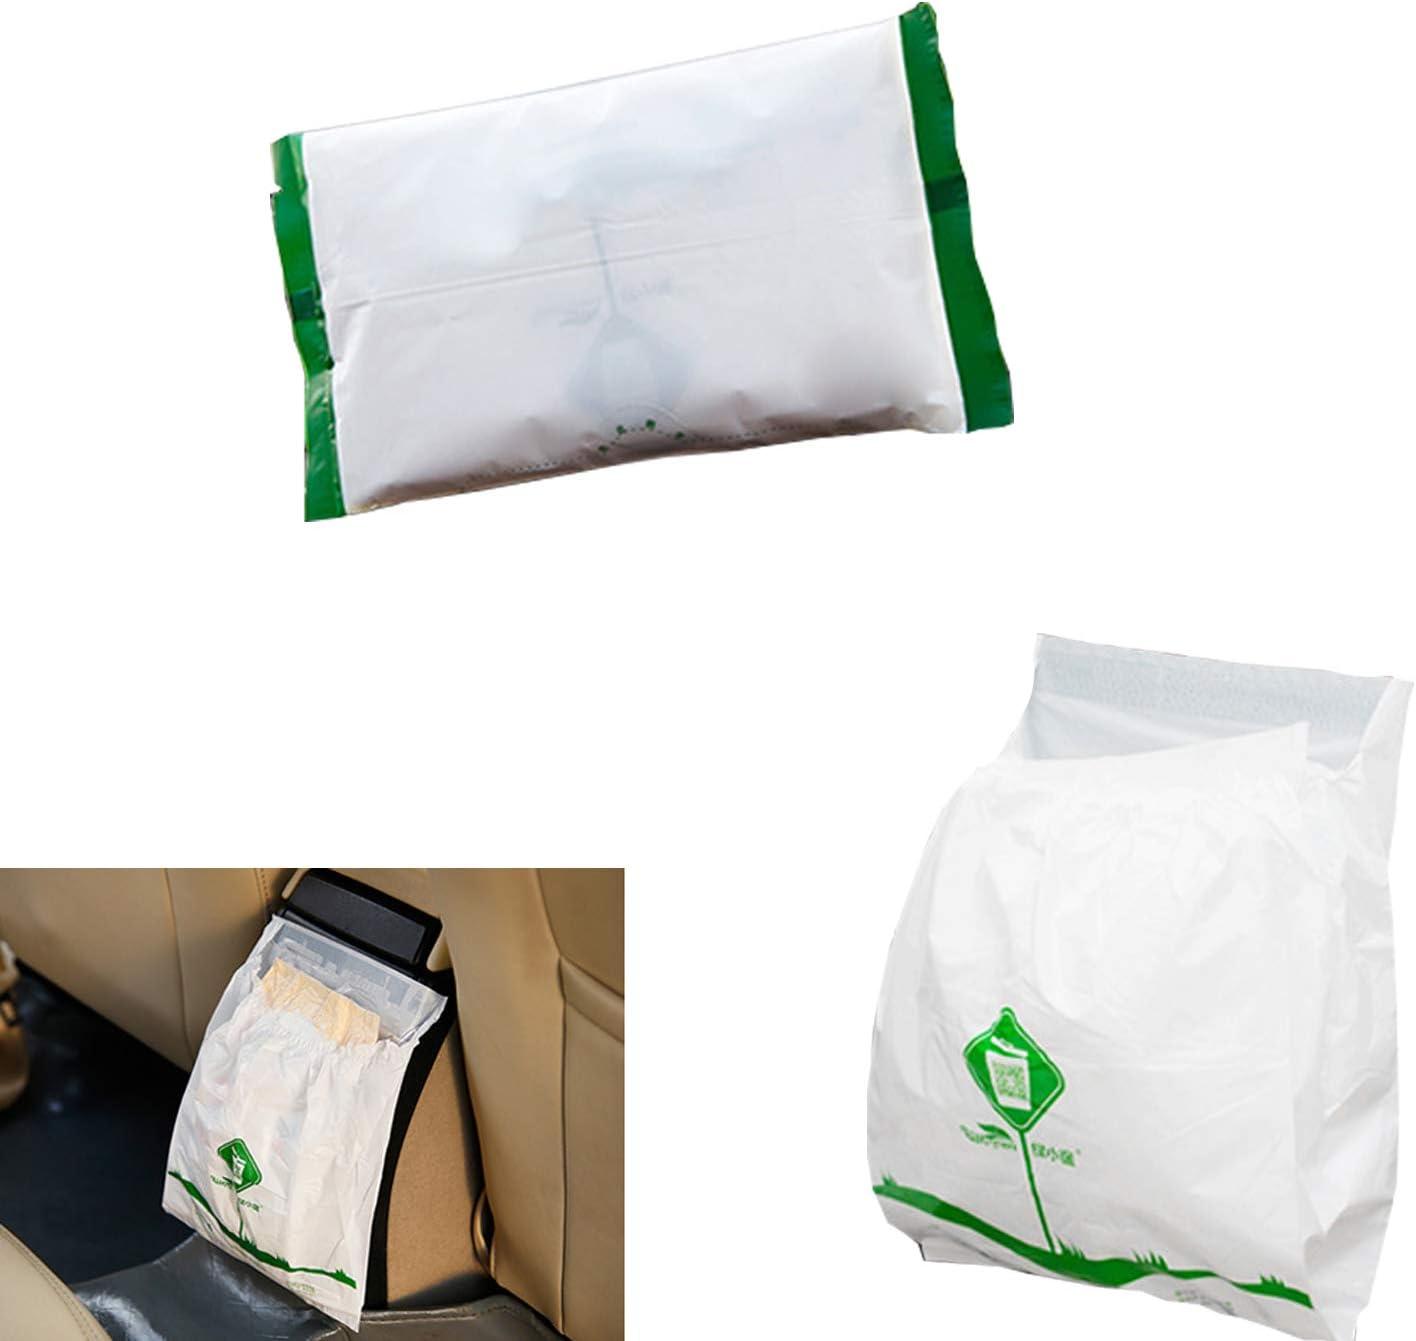 PME PIVOFUL MOBILE ENHANCEMENT 30pcs Car Trash Bag Blue Biodegradable /& Compostable Garbage Bag Rubbish Bin Bag Car Trash Bin Gag Disposable Container Bag for Office Babyroom Bathroom Study Room